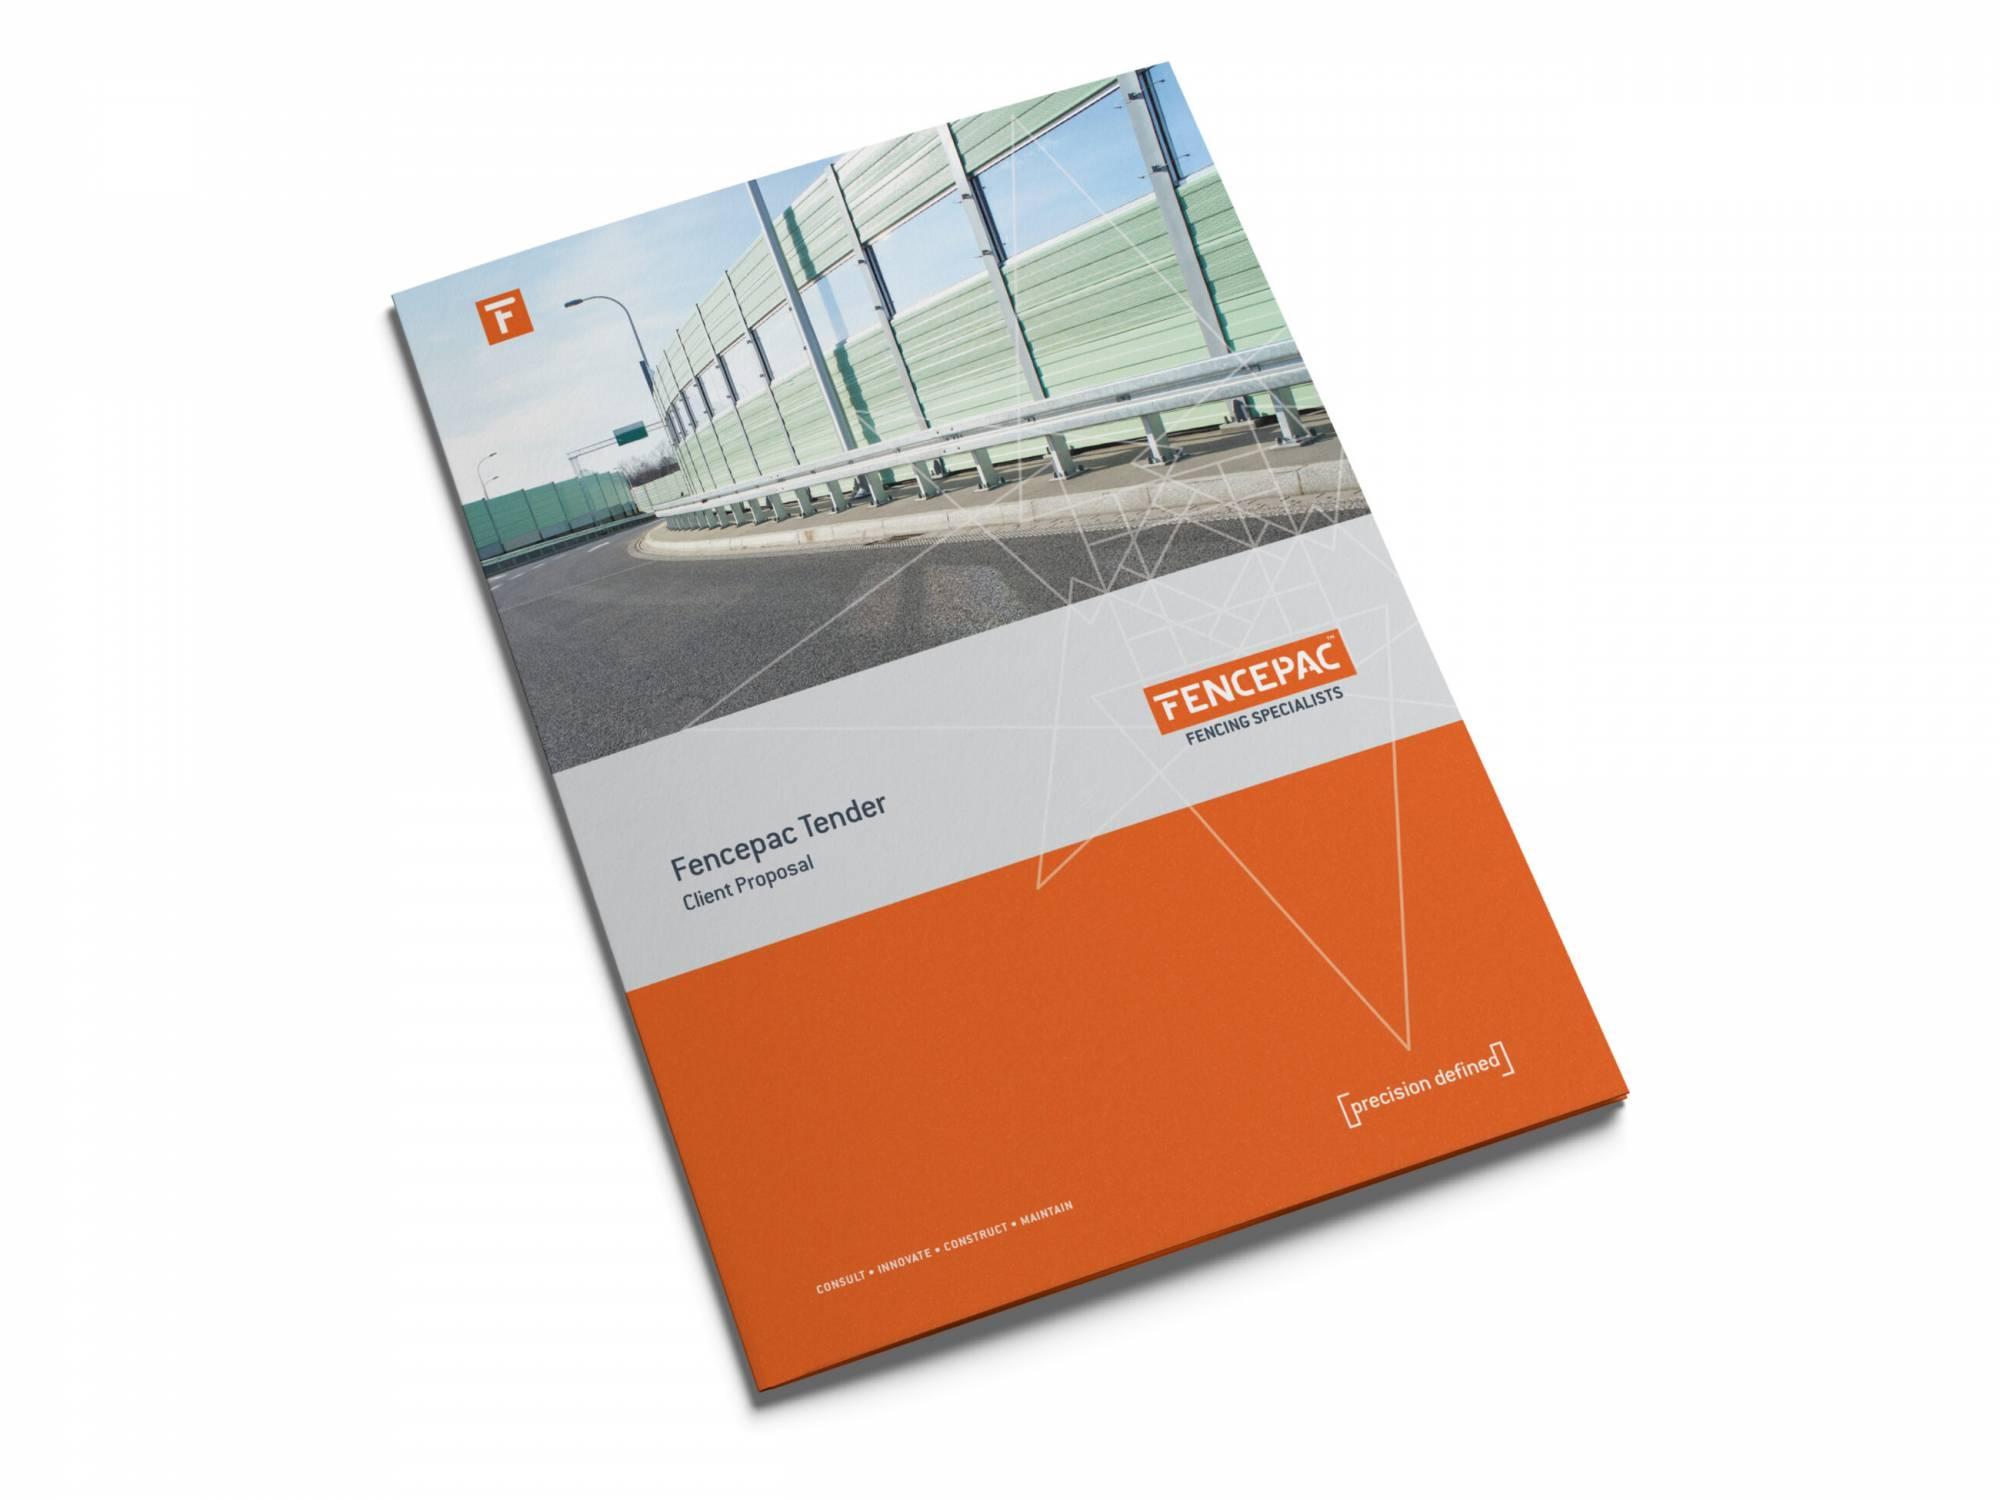 Fencepac - Brochure example